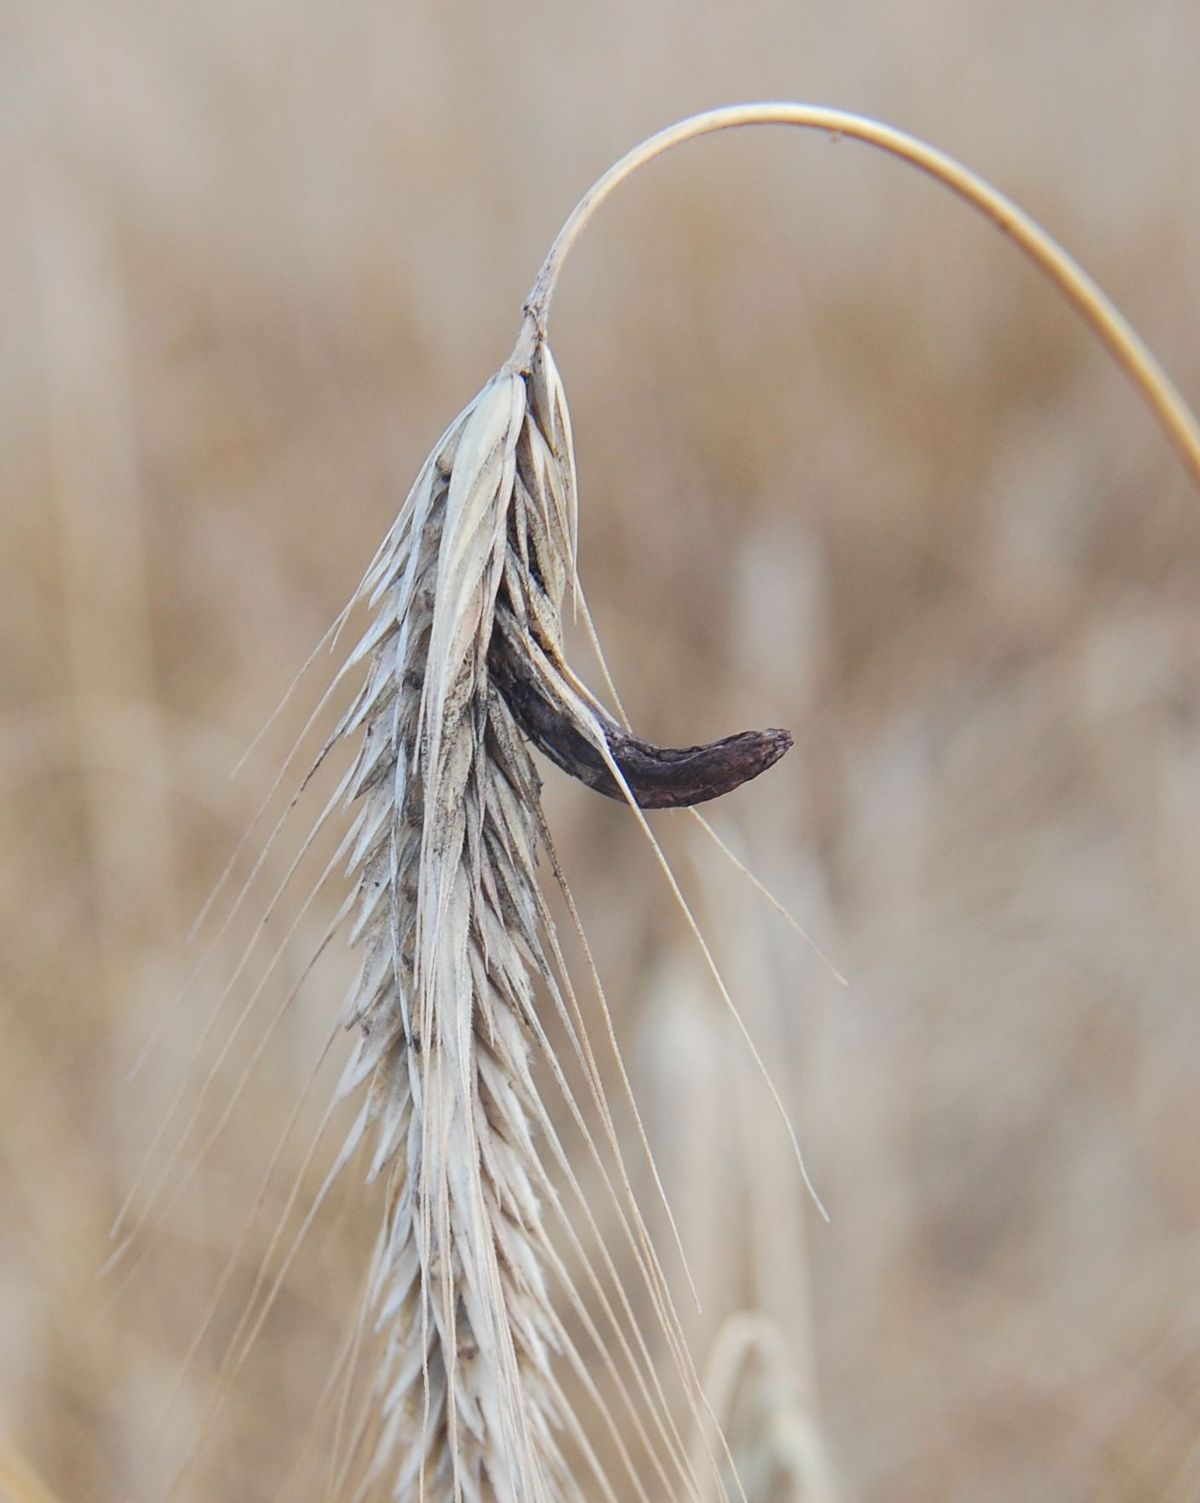 Anyarozs vagy varjúköröm (Claviceps purpurea) | Körinfo Ergot parazita